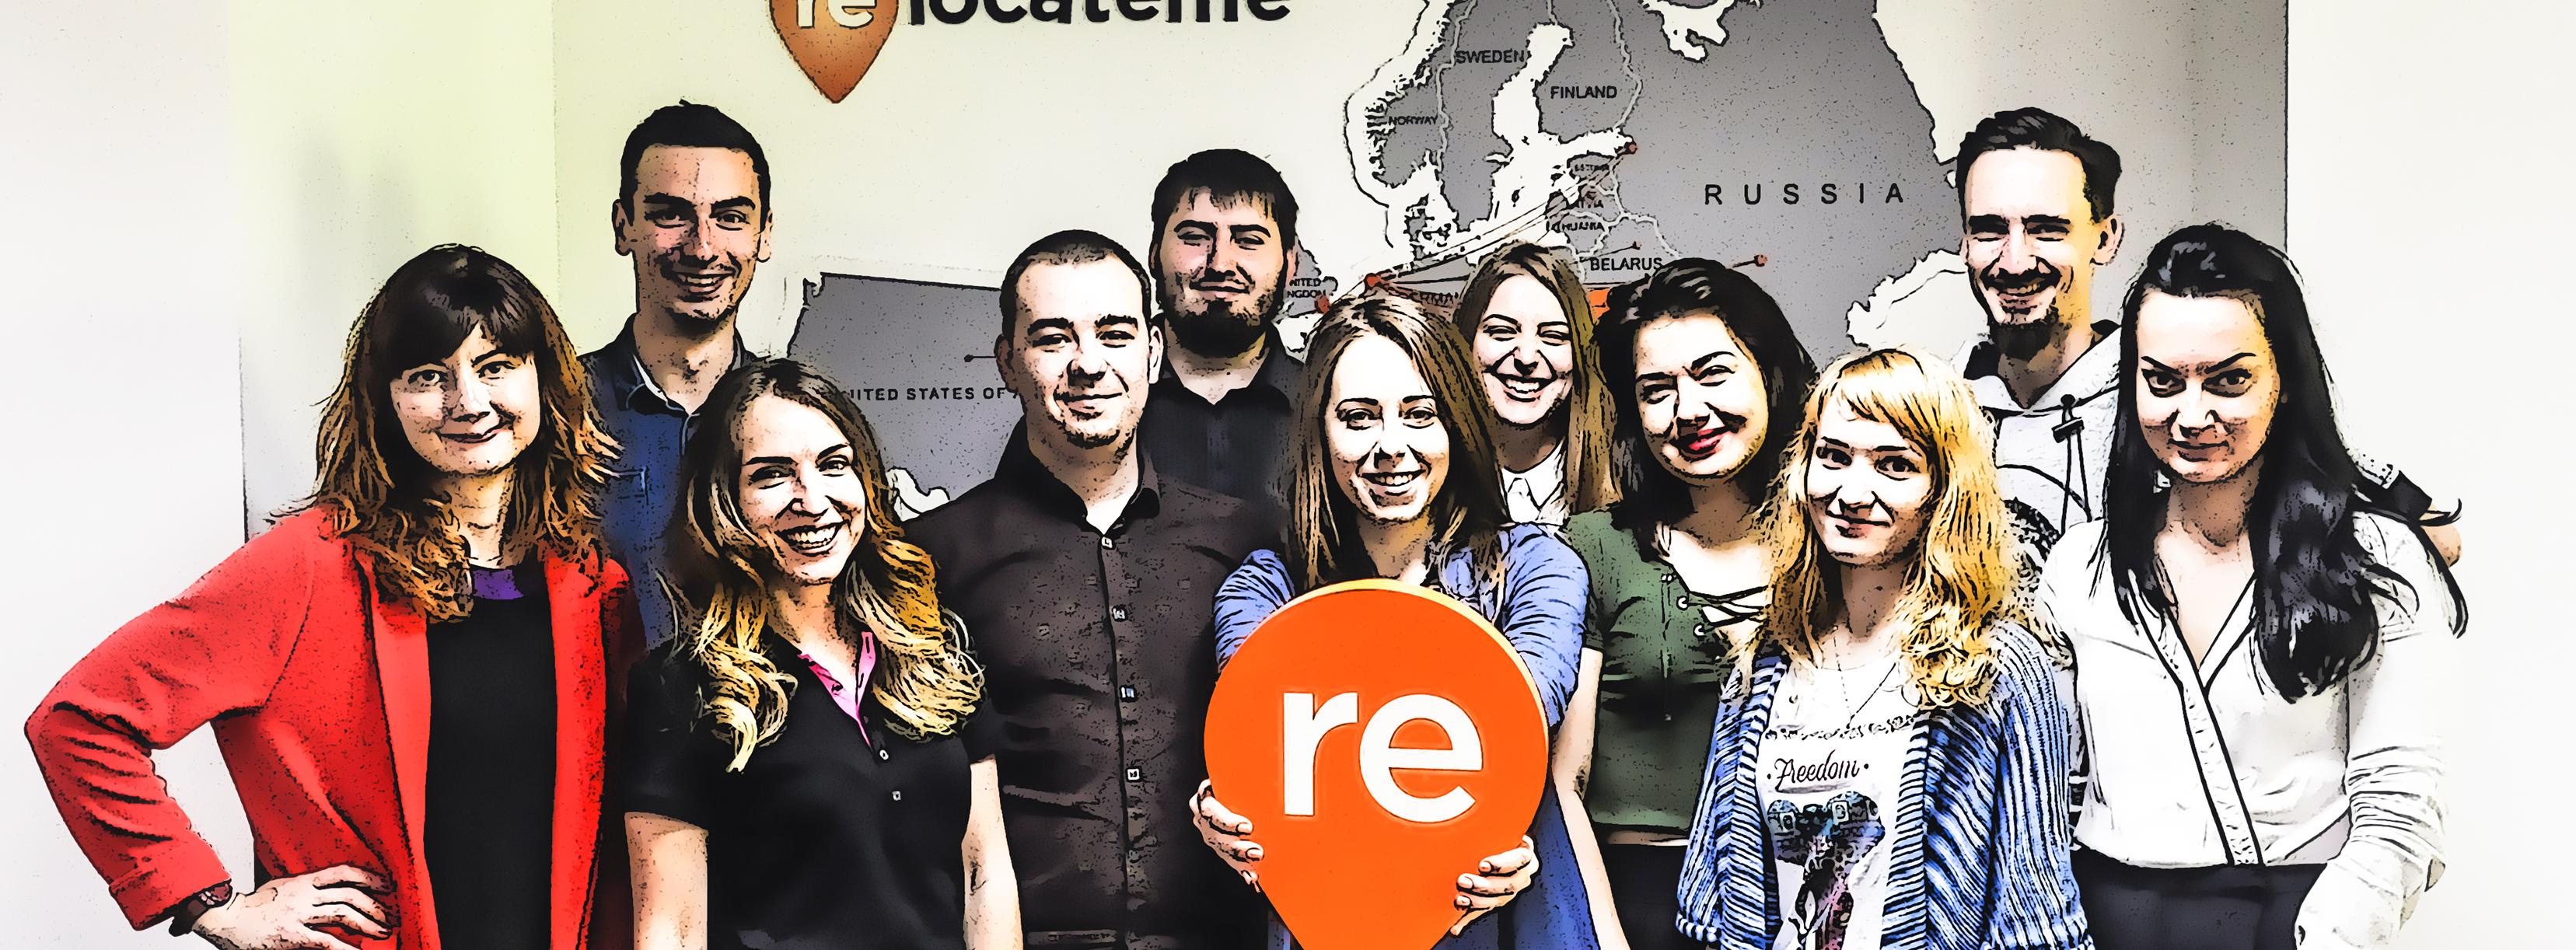 The-RM-squad-2 — Relocateme.eu - Job relocation service